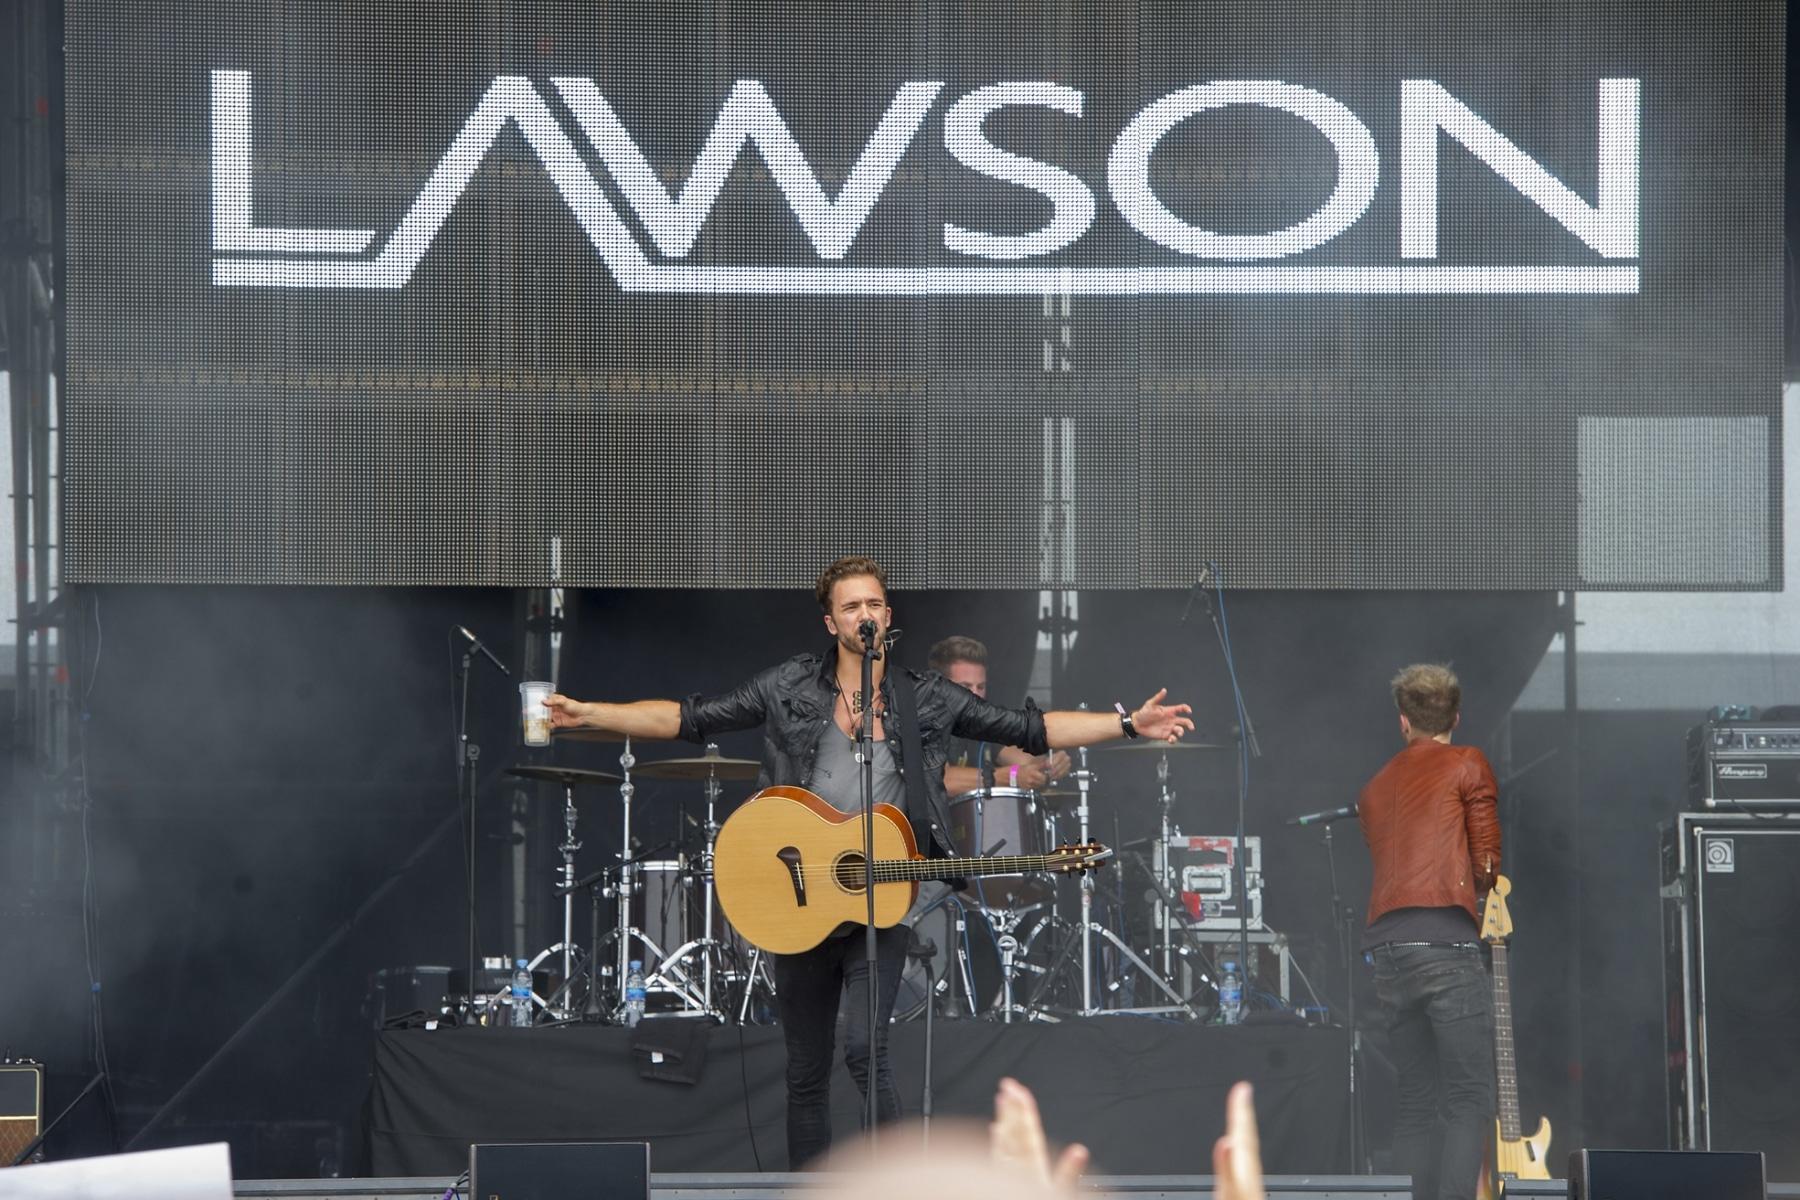 gibraltar-music-festival-2013-lawson_9703139958_o